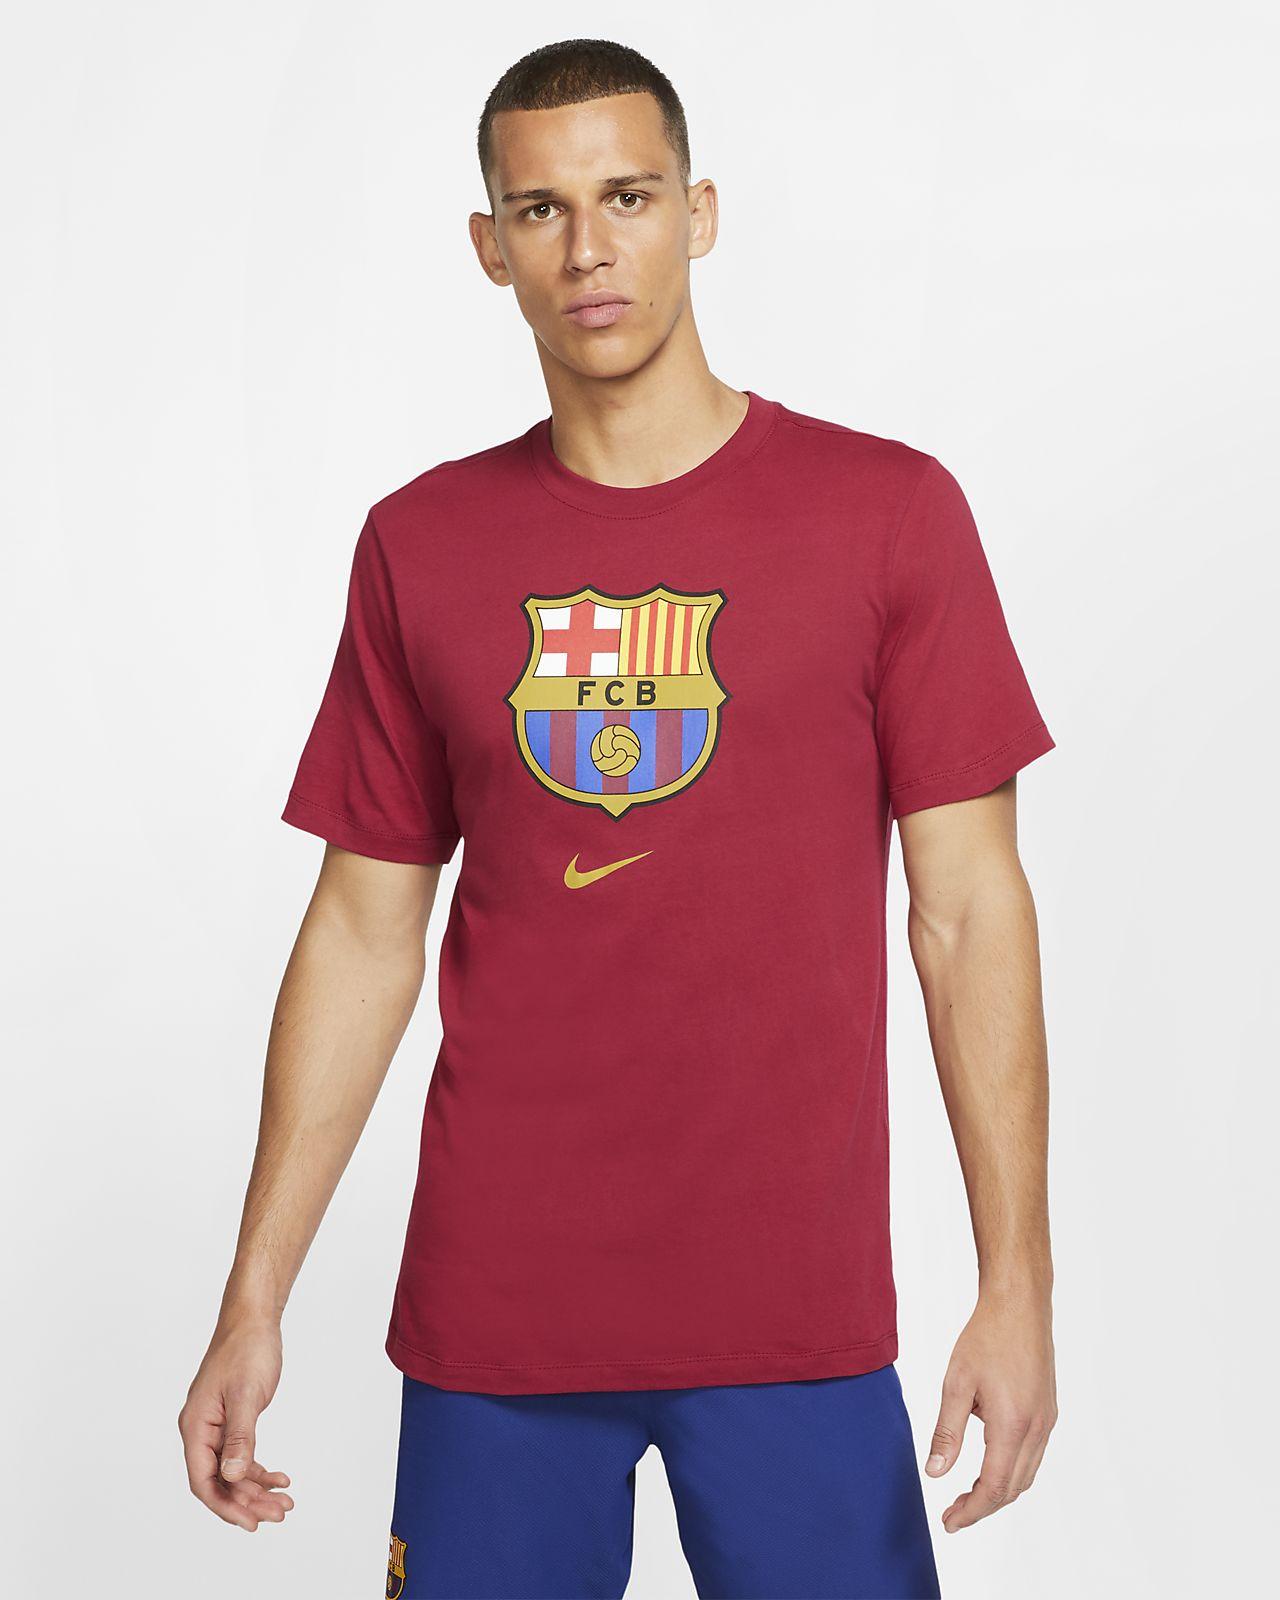 FC Barcelona Men's T-Shirt